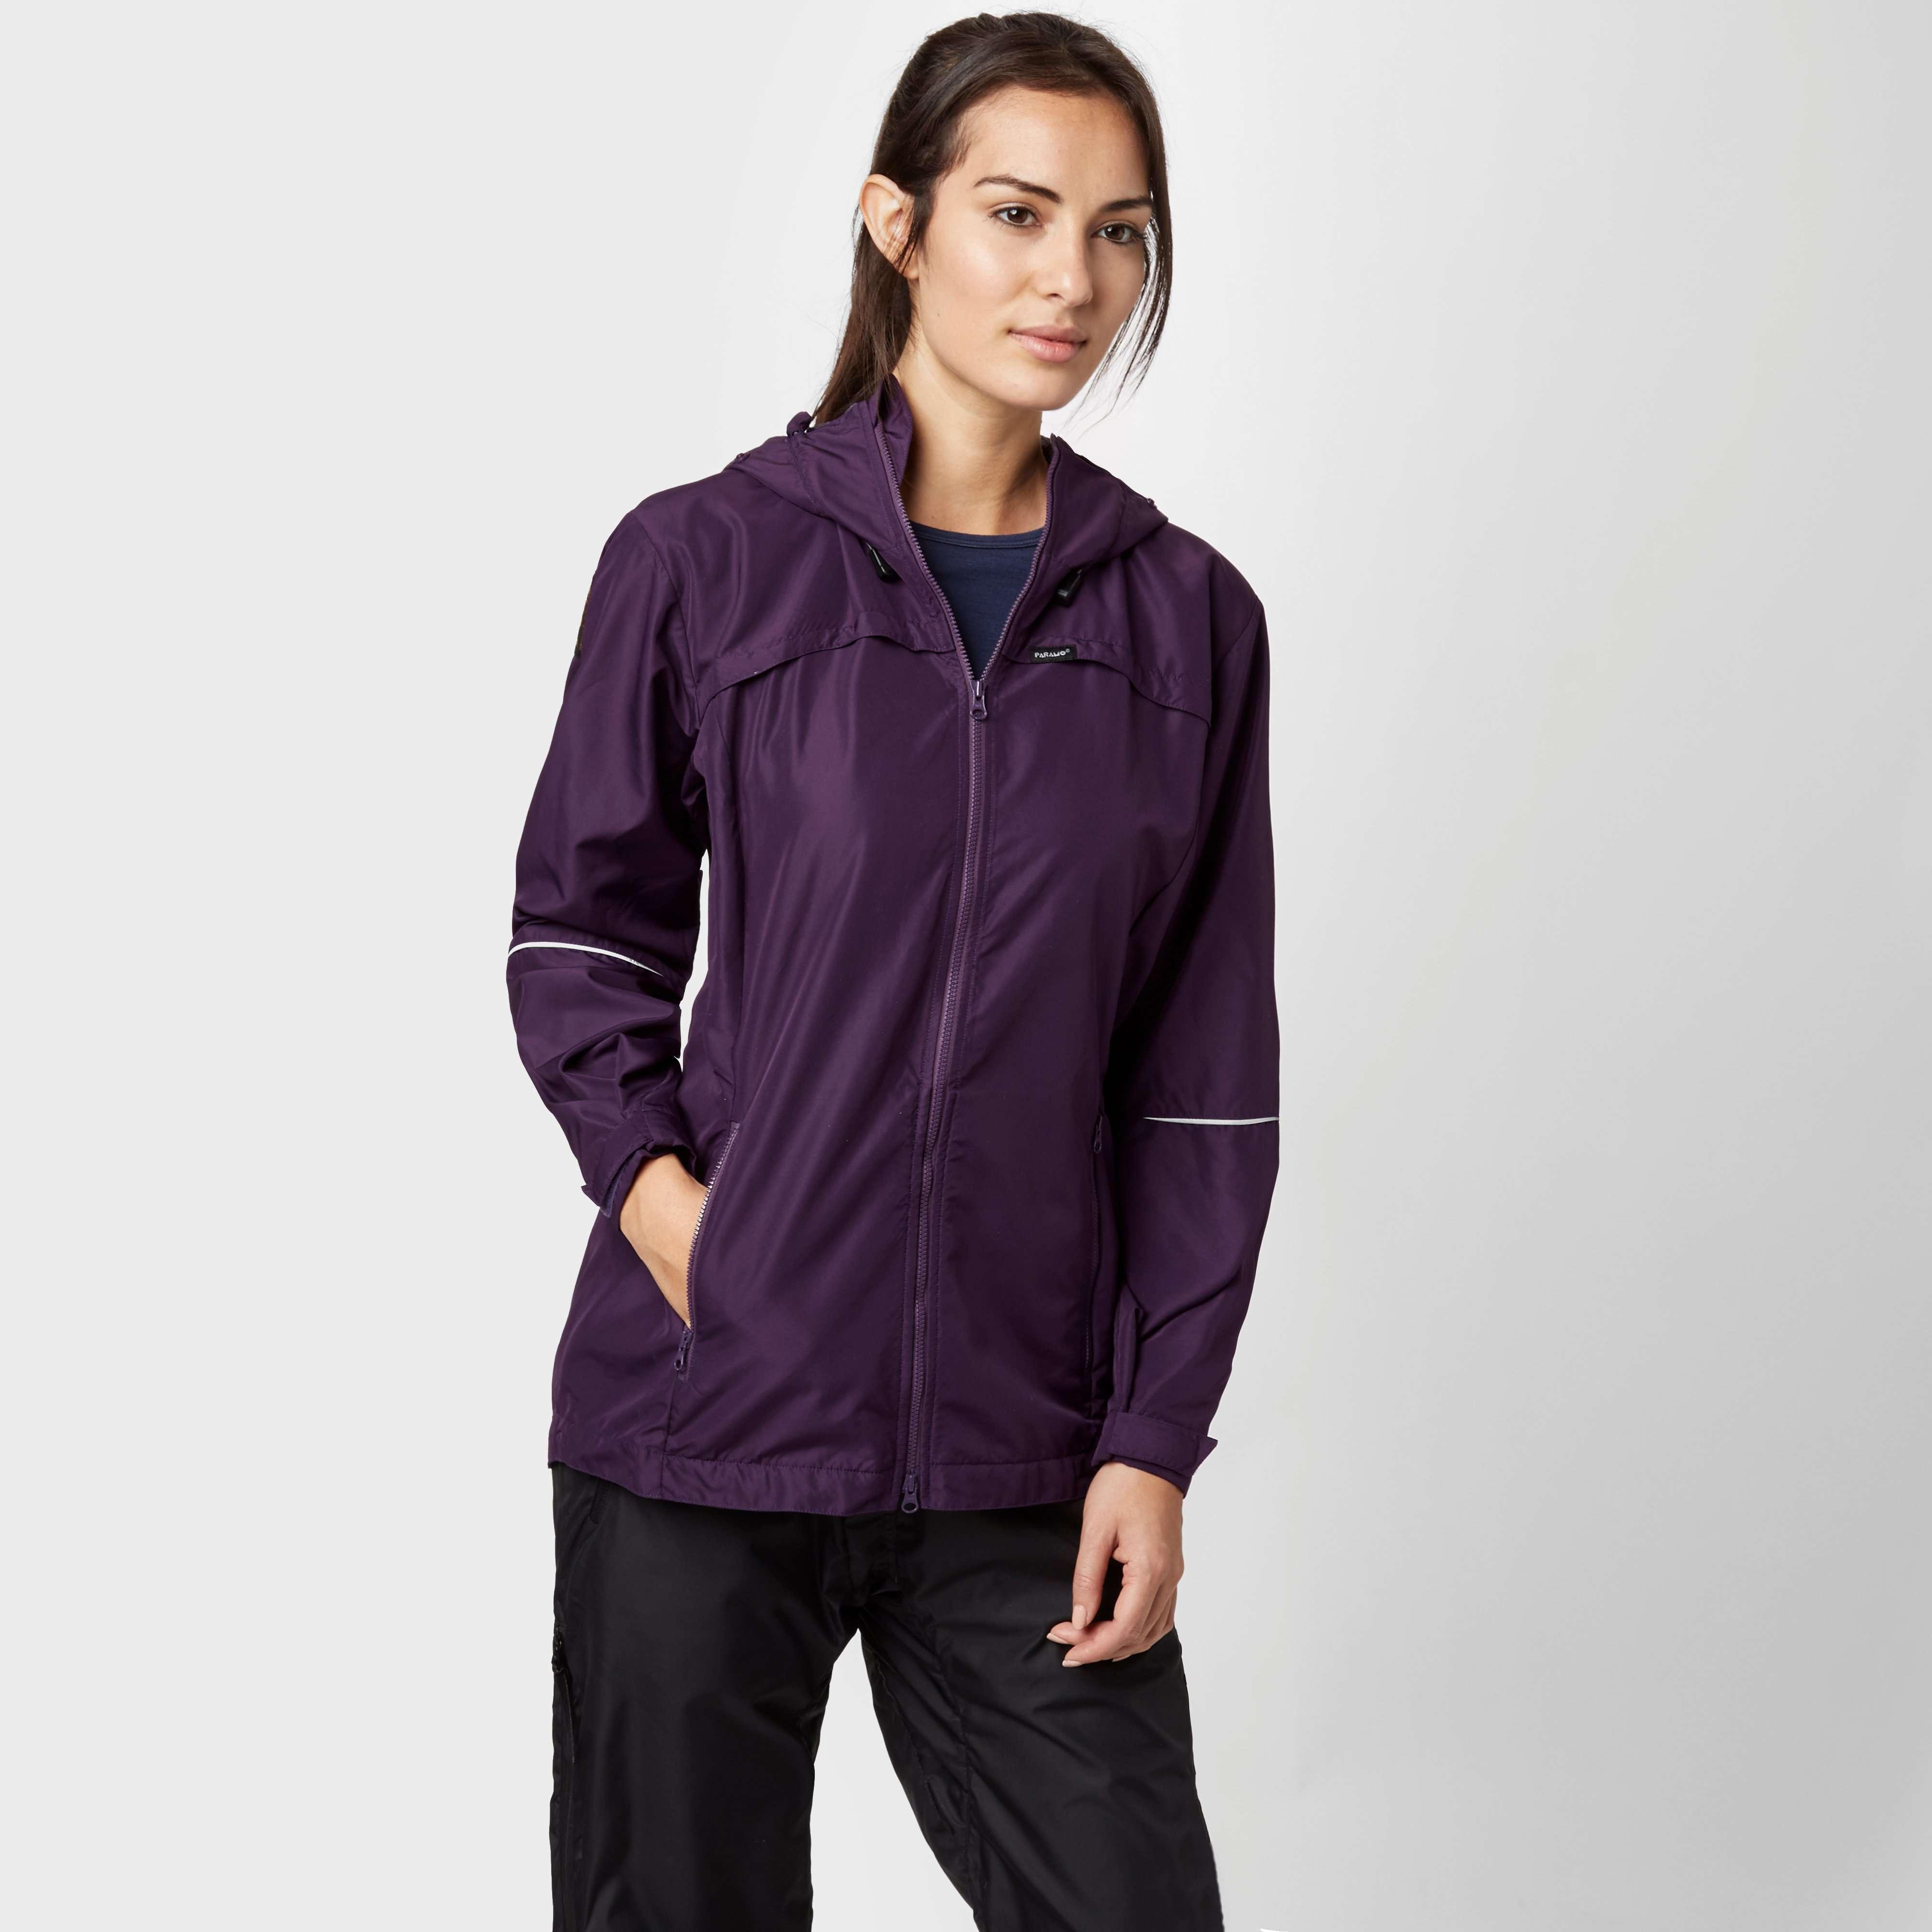 PARAMO Women's Zefira Windproof Jacket